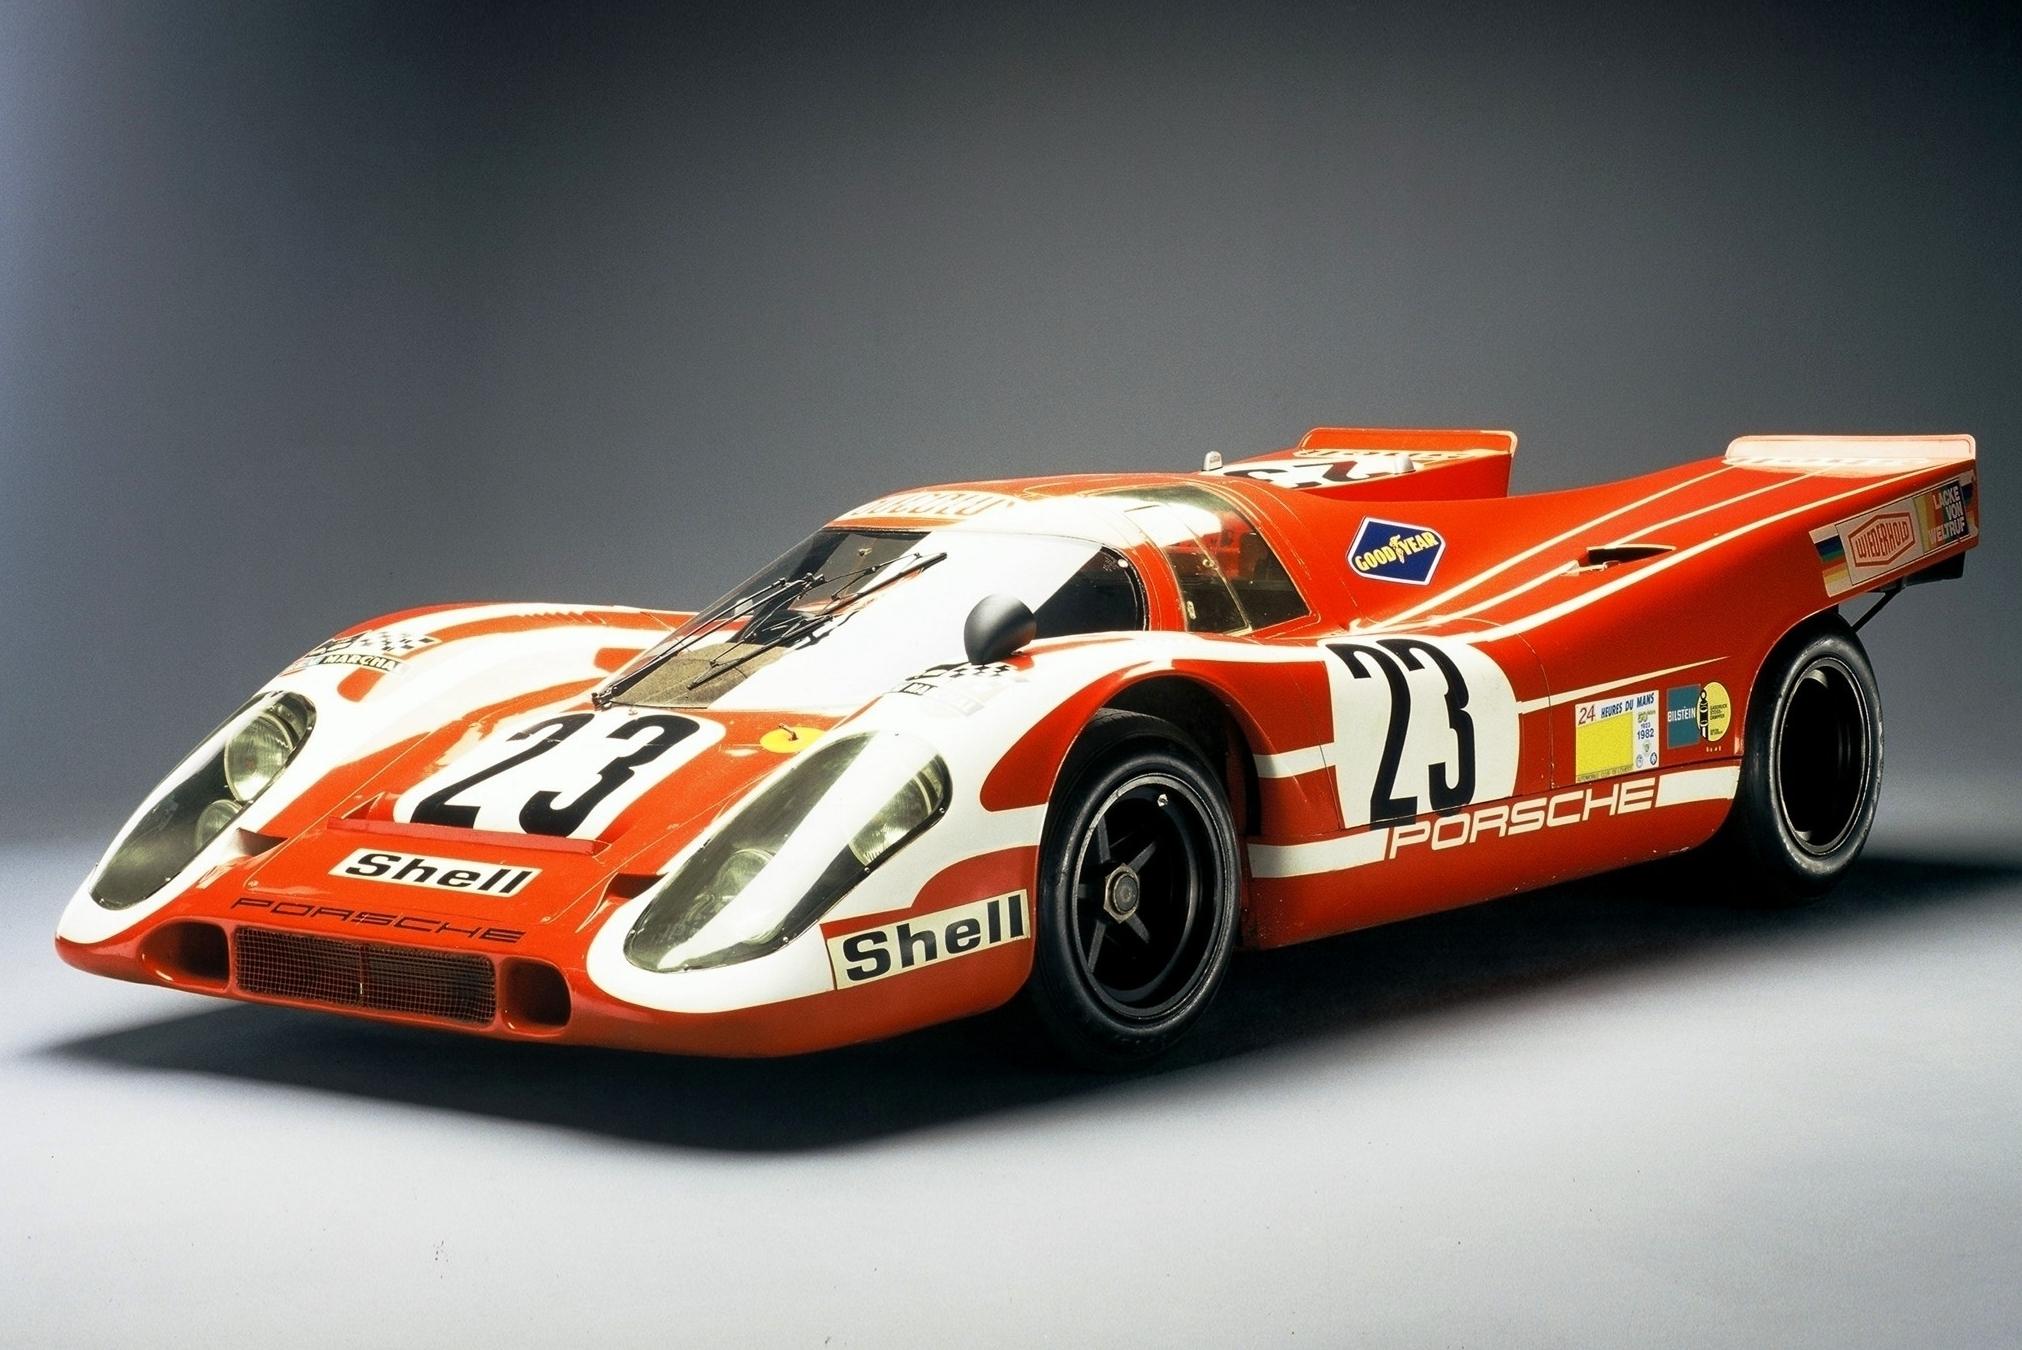 Porsche 917 Kurzheck vitorioso tinha motor flat-12 4.5